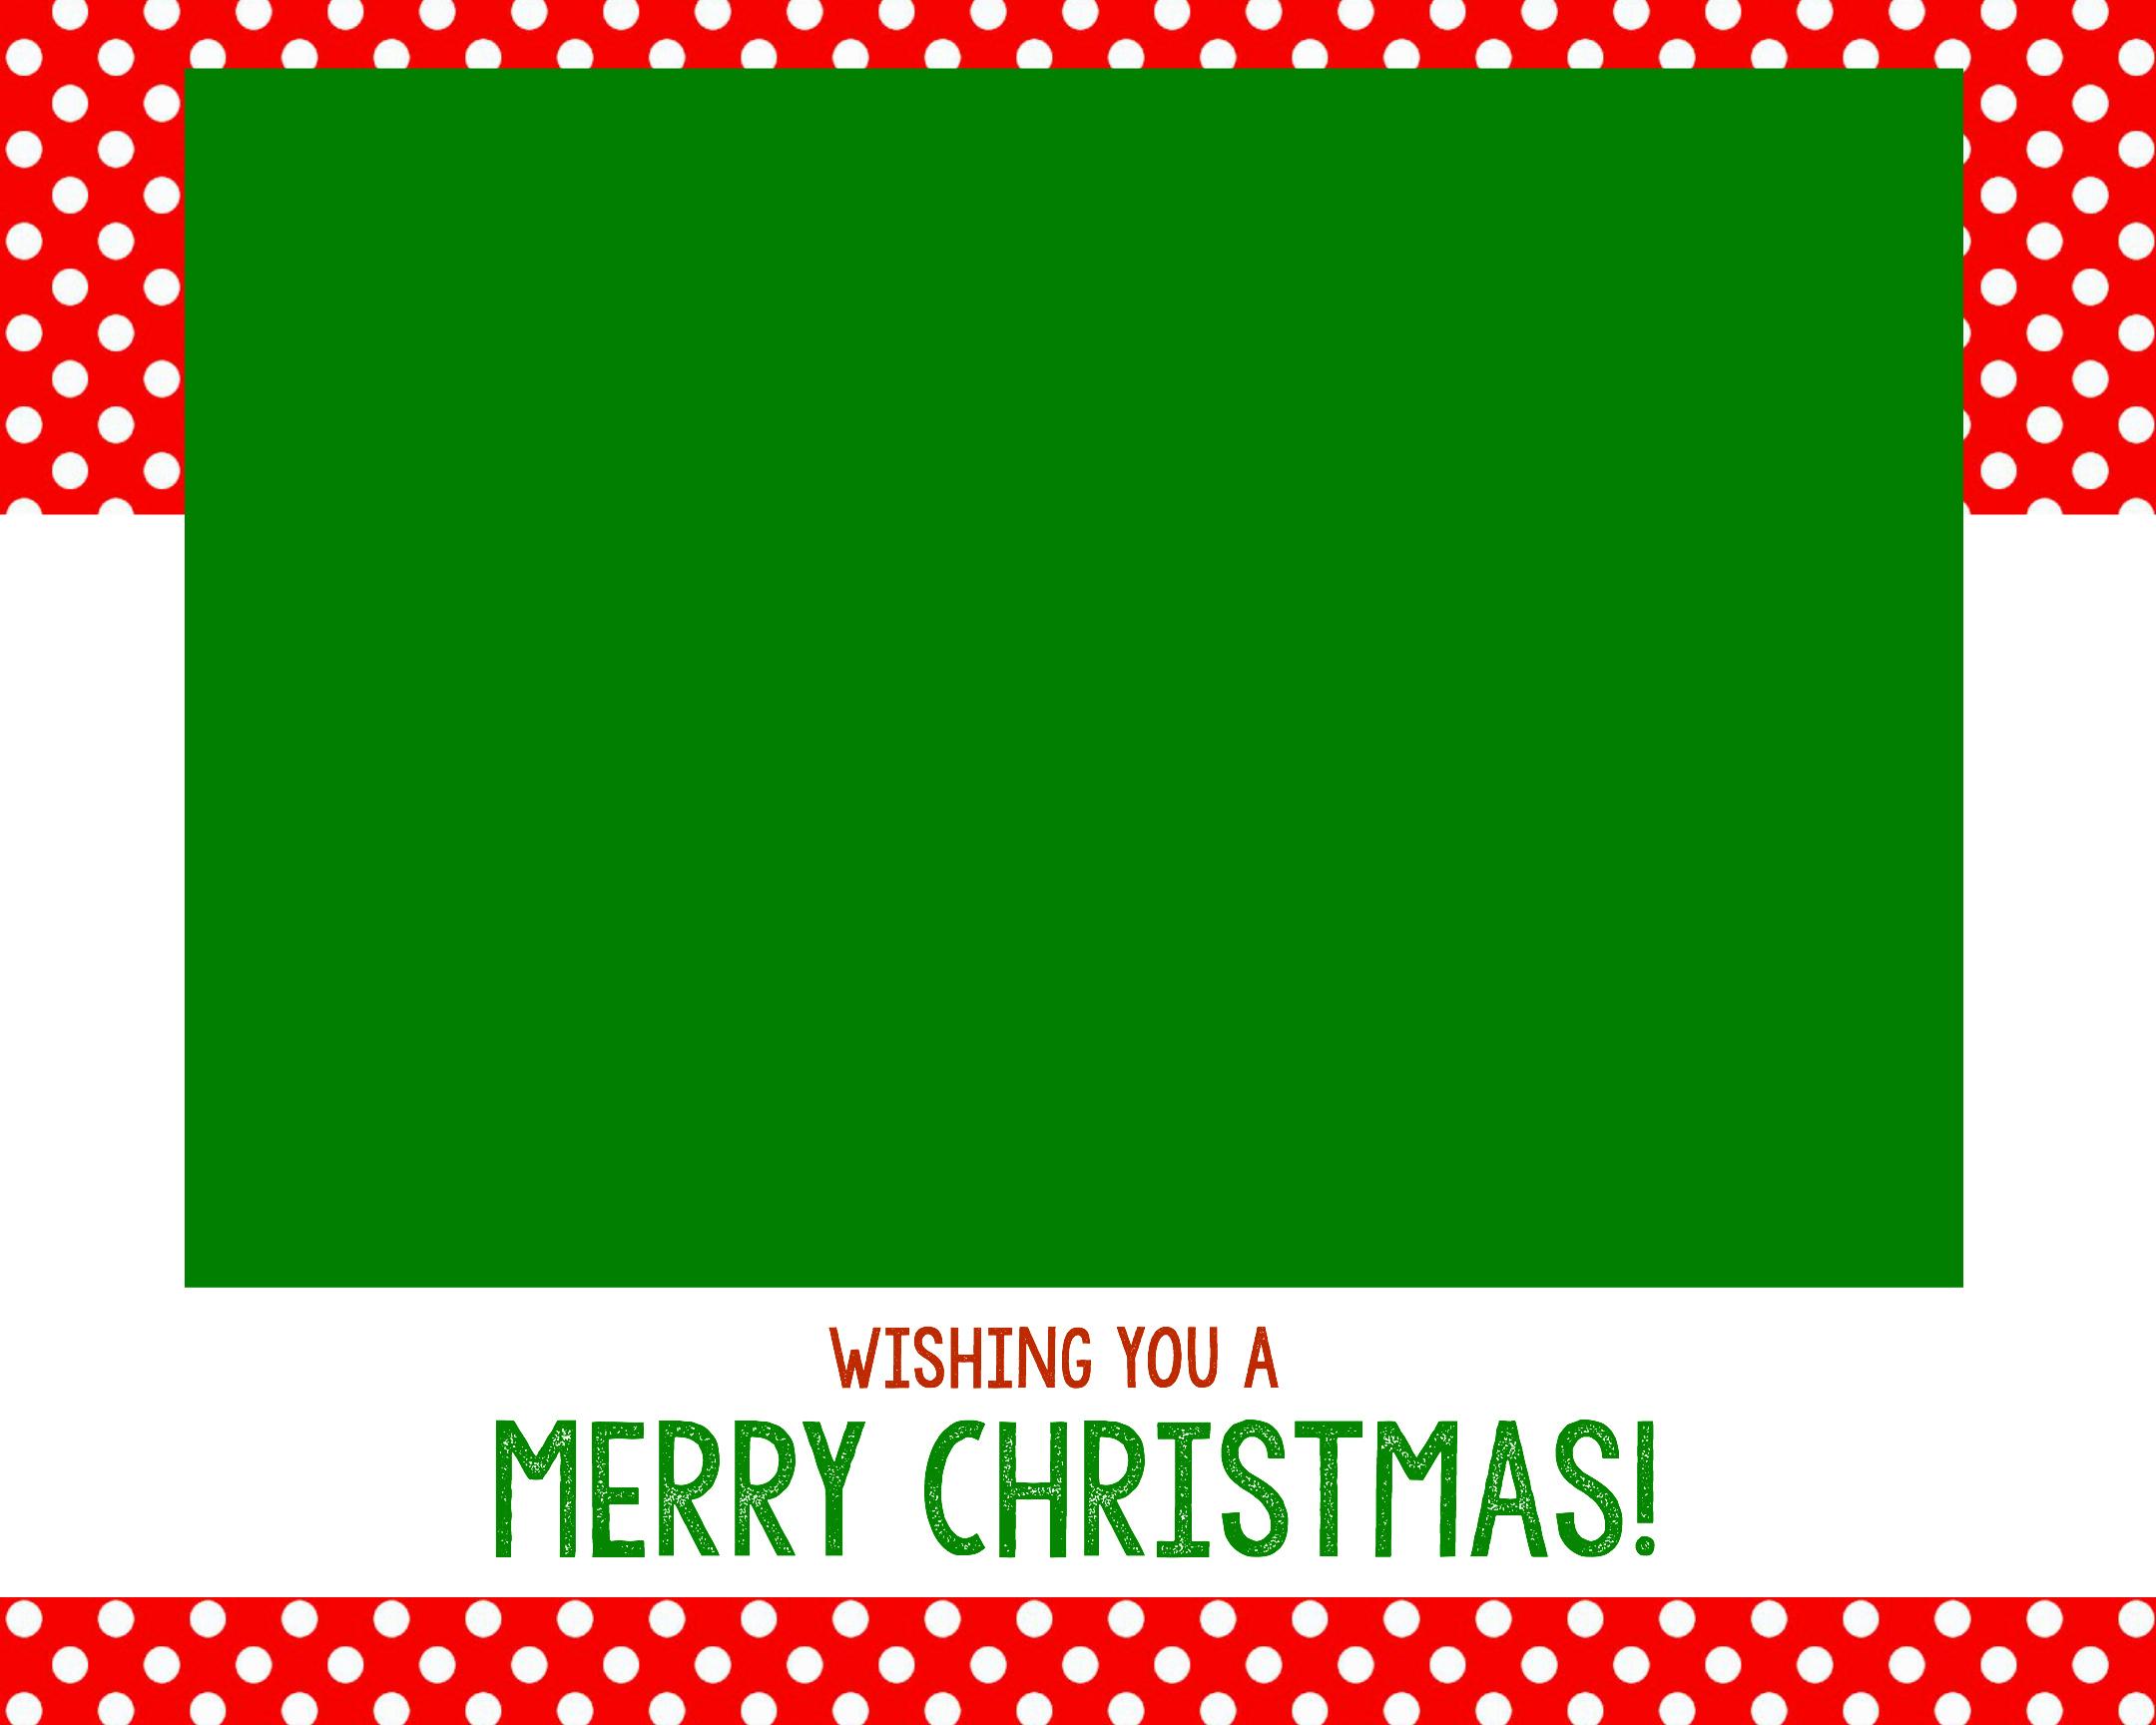 Christmas Photo Card Templates | Texas Vet - Free Online Christmas Photo Card Maker Printable